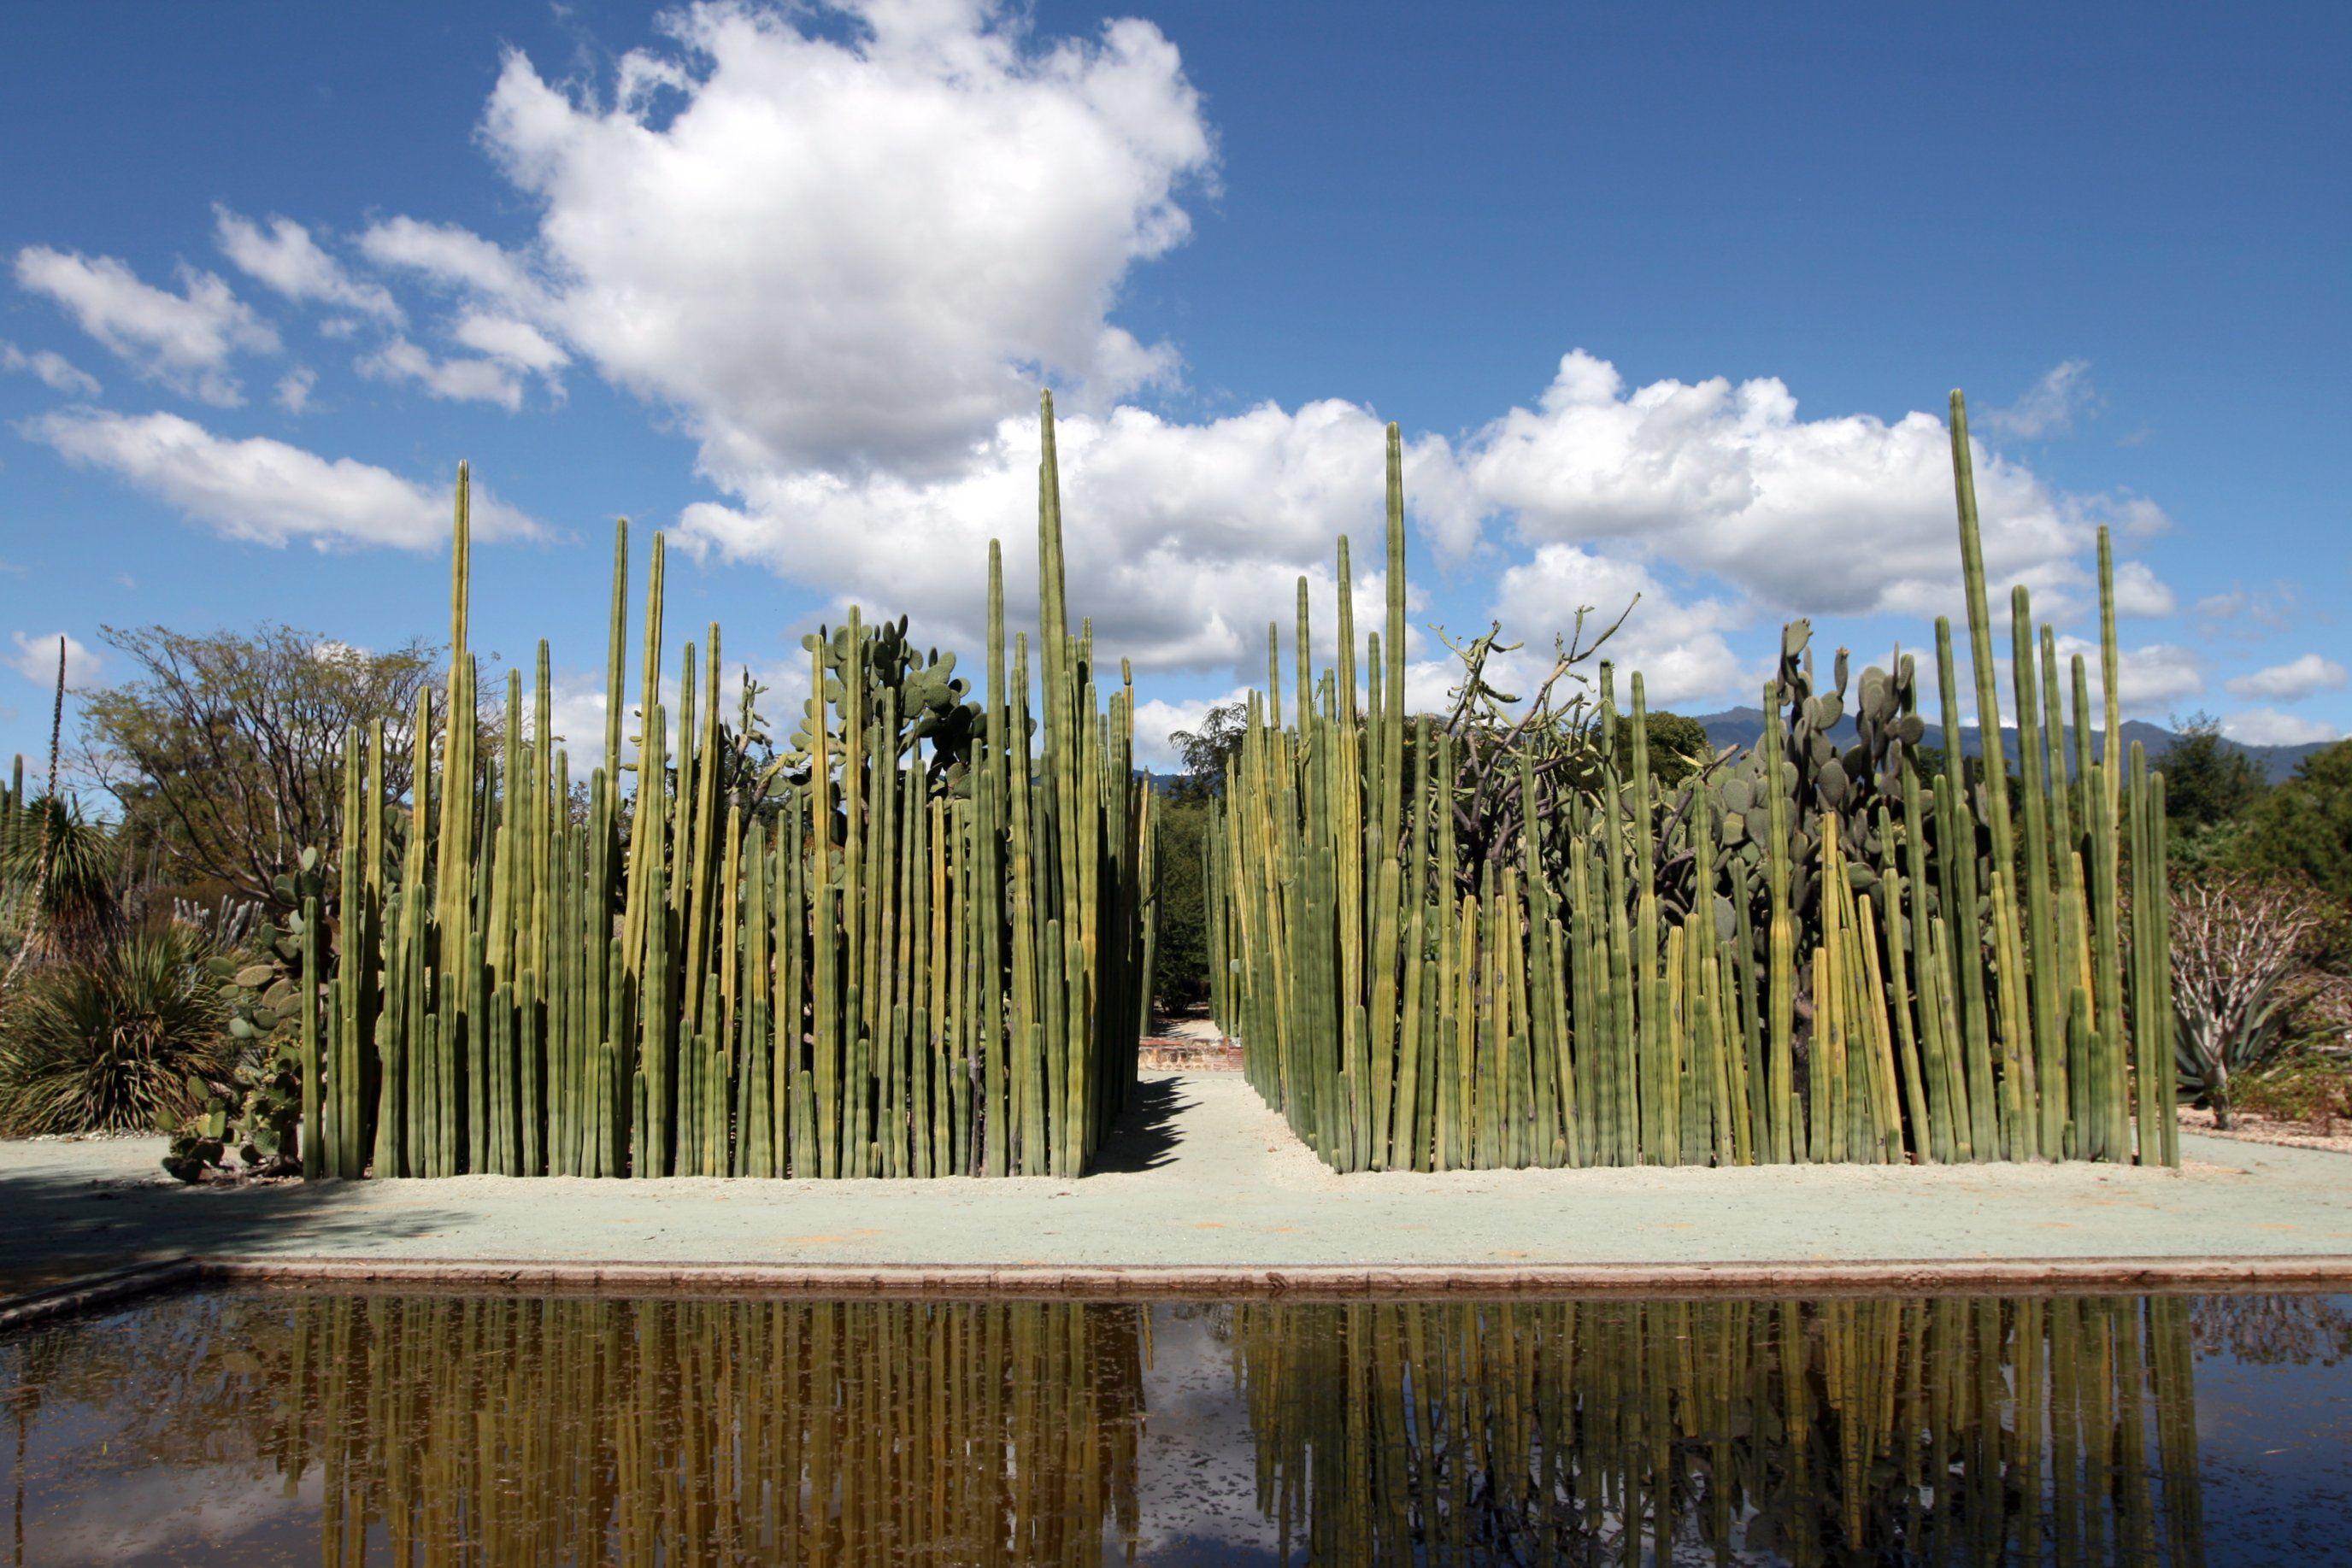 Jardin etnobotanico oaxaca mexico photography for Jardin oaxaca